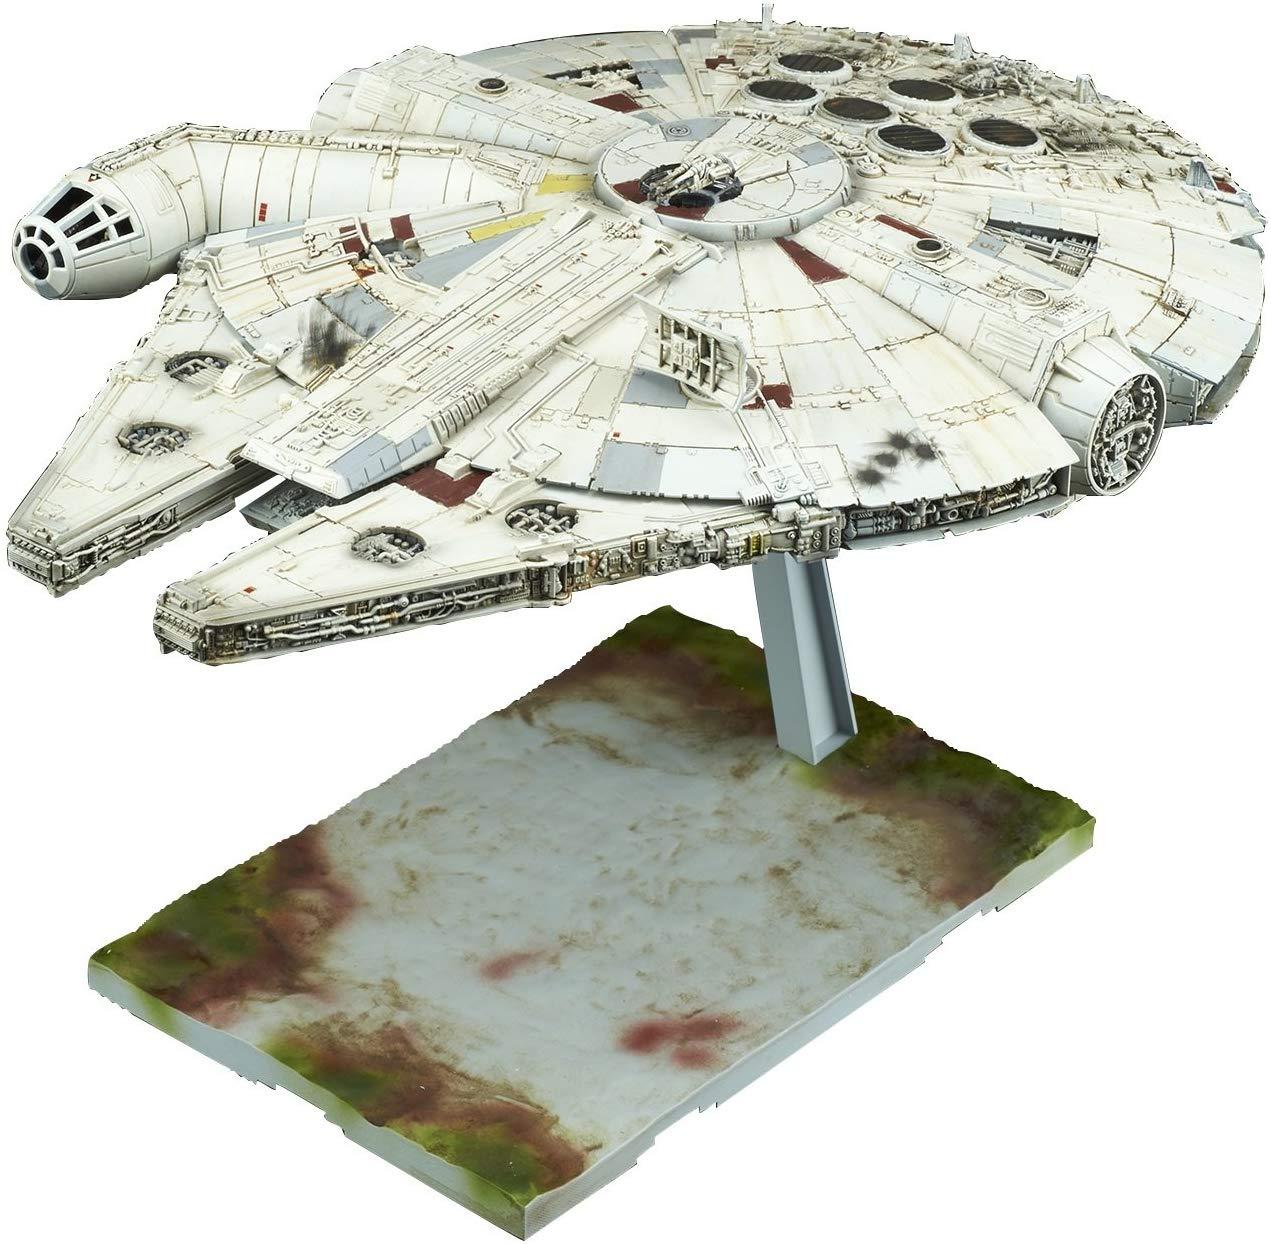 It's Back!: Bandai Hobby Star Wars: The Last Jedi Millennium Falcon Model Kit $24